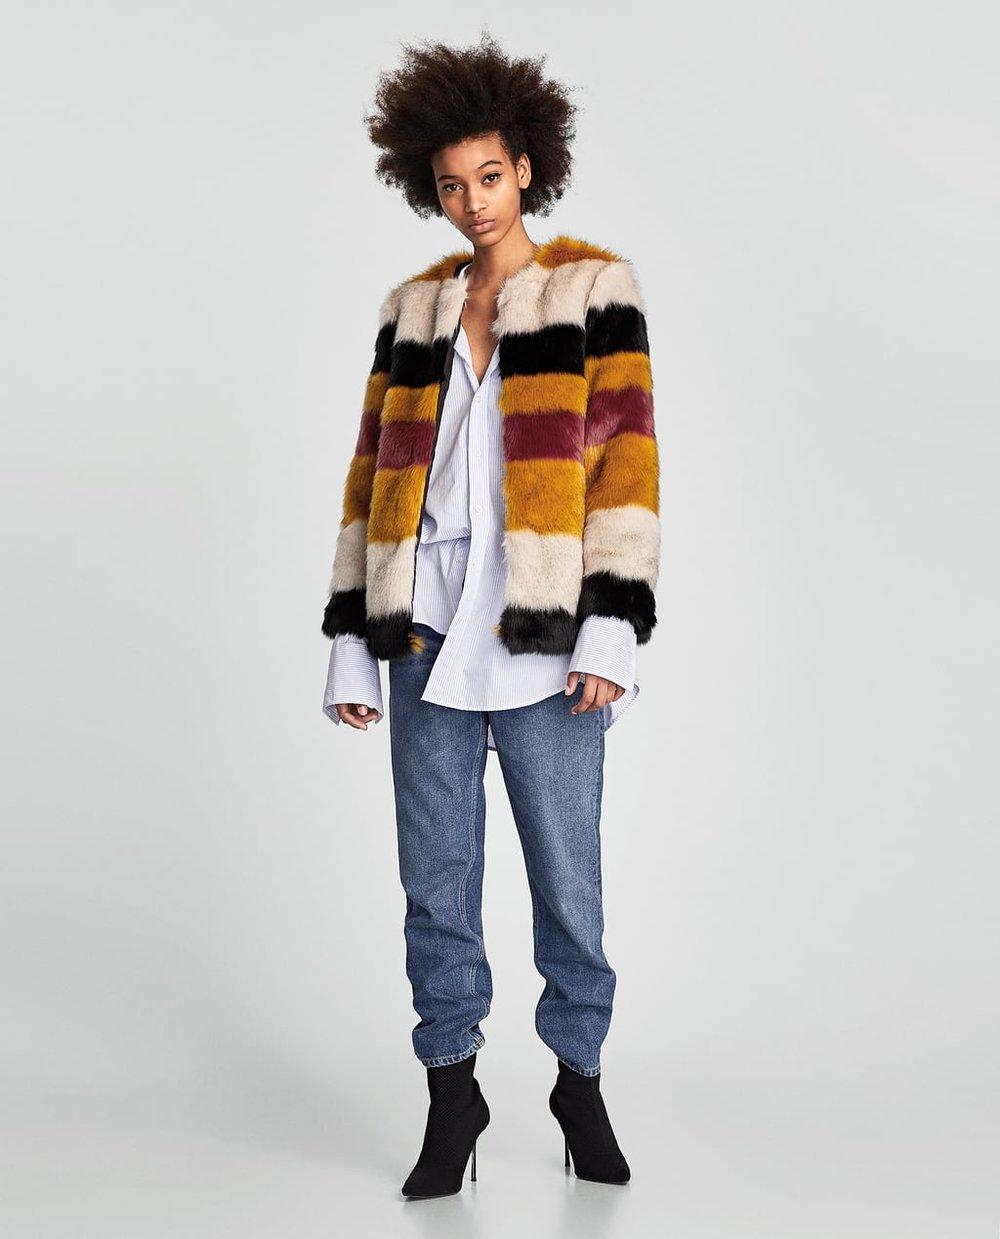 1. Zara Contrast Fur